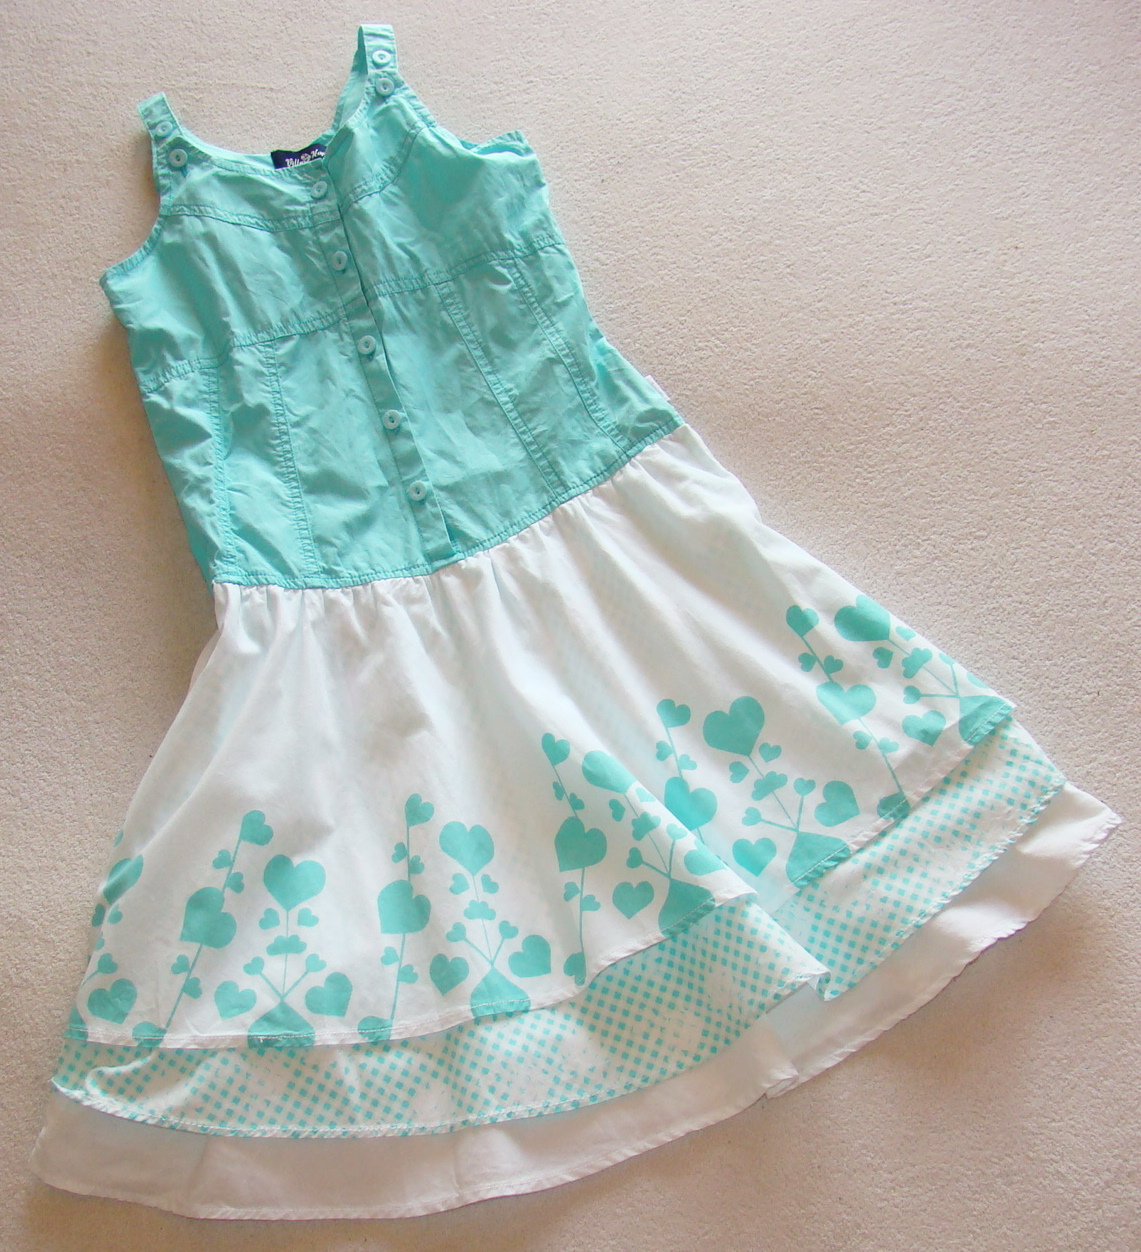 b75ab7dc35 Śliczna sukienka 140 cm 9-10 lat LATO VILLA HAPP - 7328817611 ...